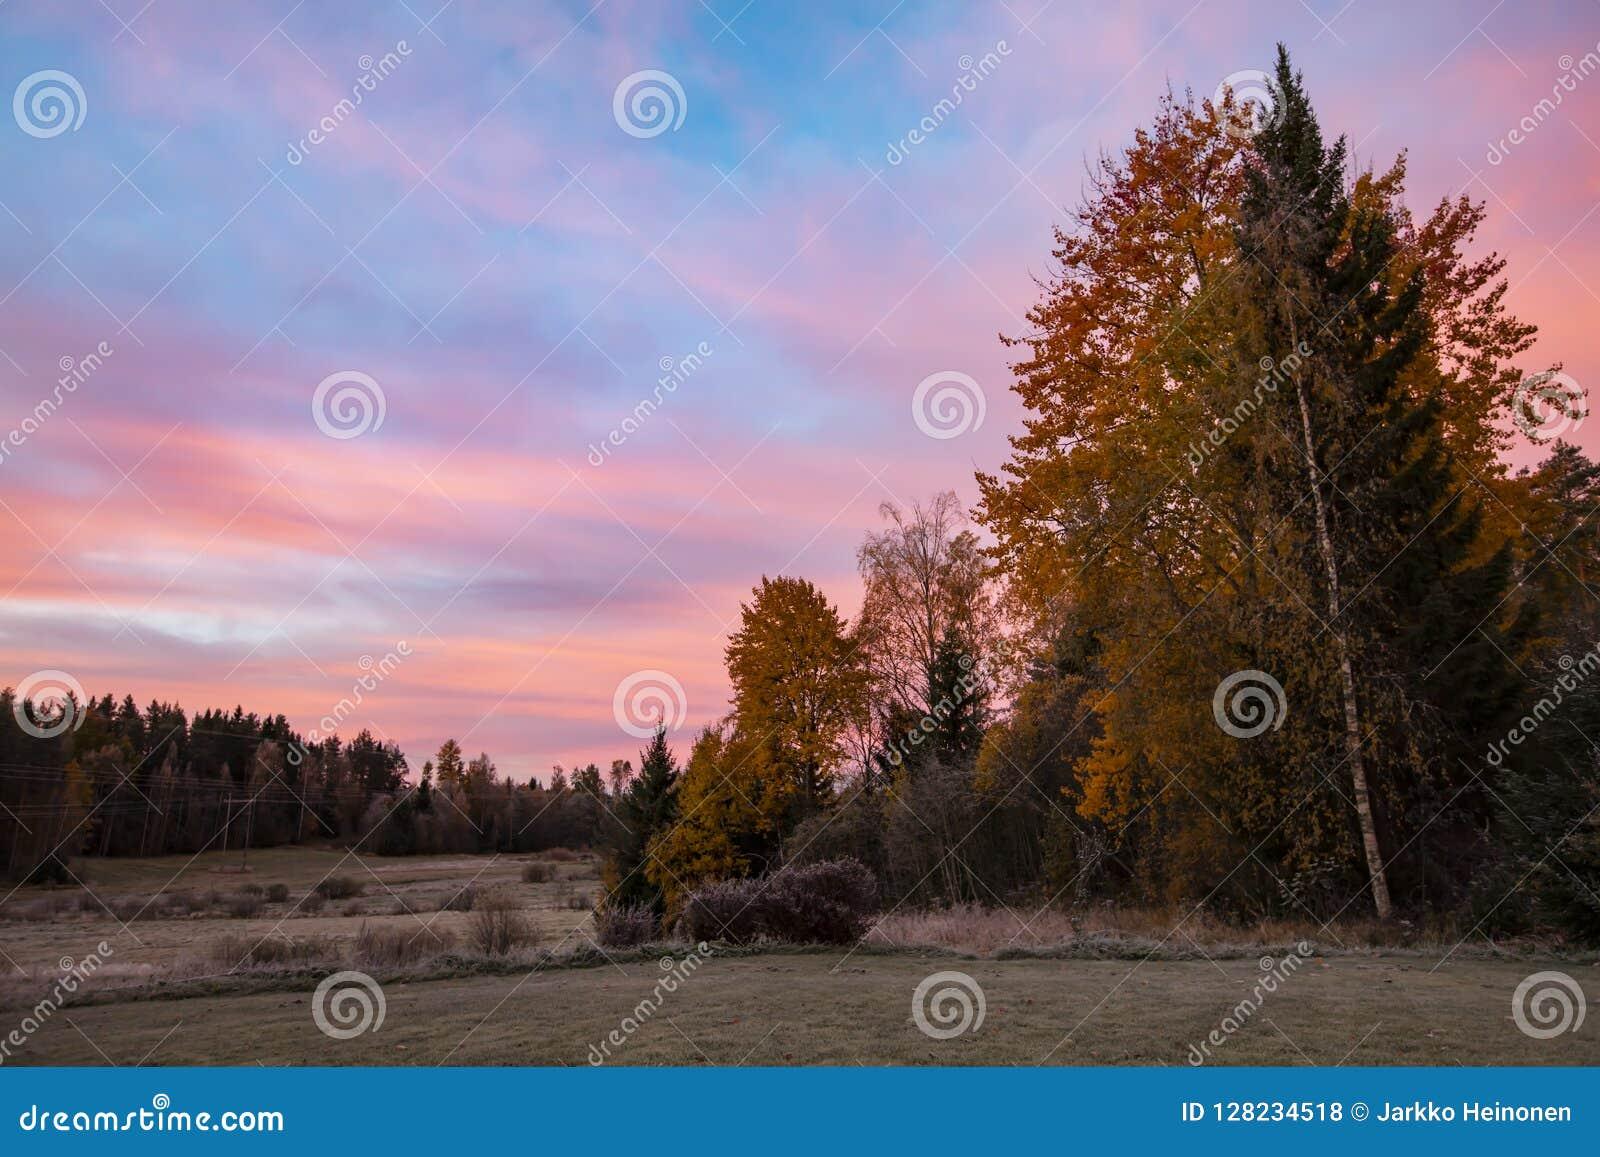 Paisaje de color naranja hermoso de la mañana en Finlandia